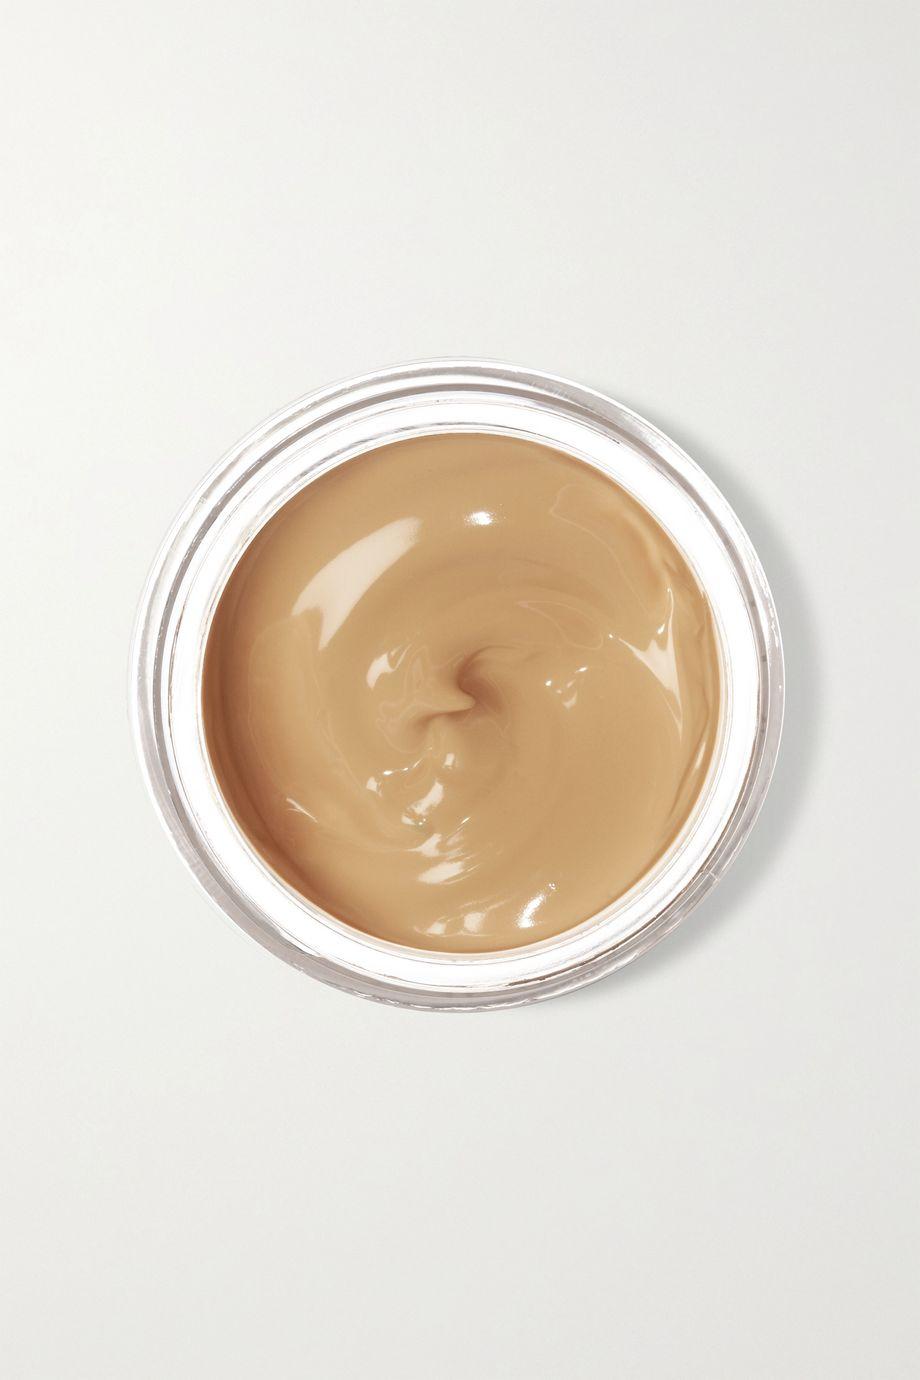 Chantecaille Future Skin Oil Free Gel Foundation - Shea, 30g